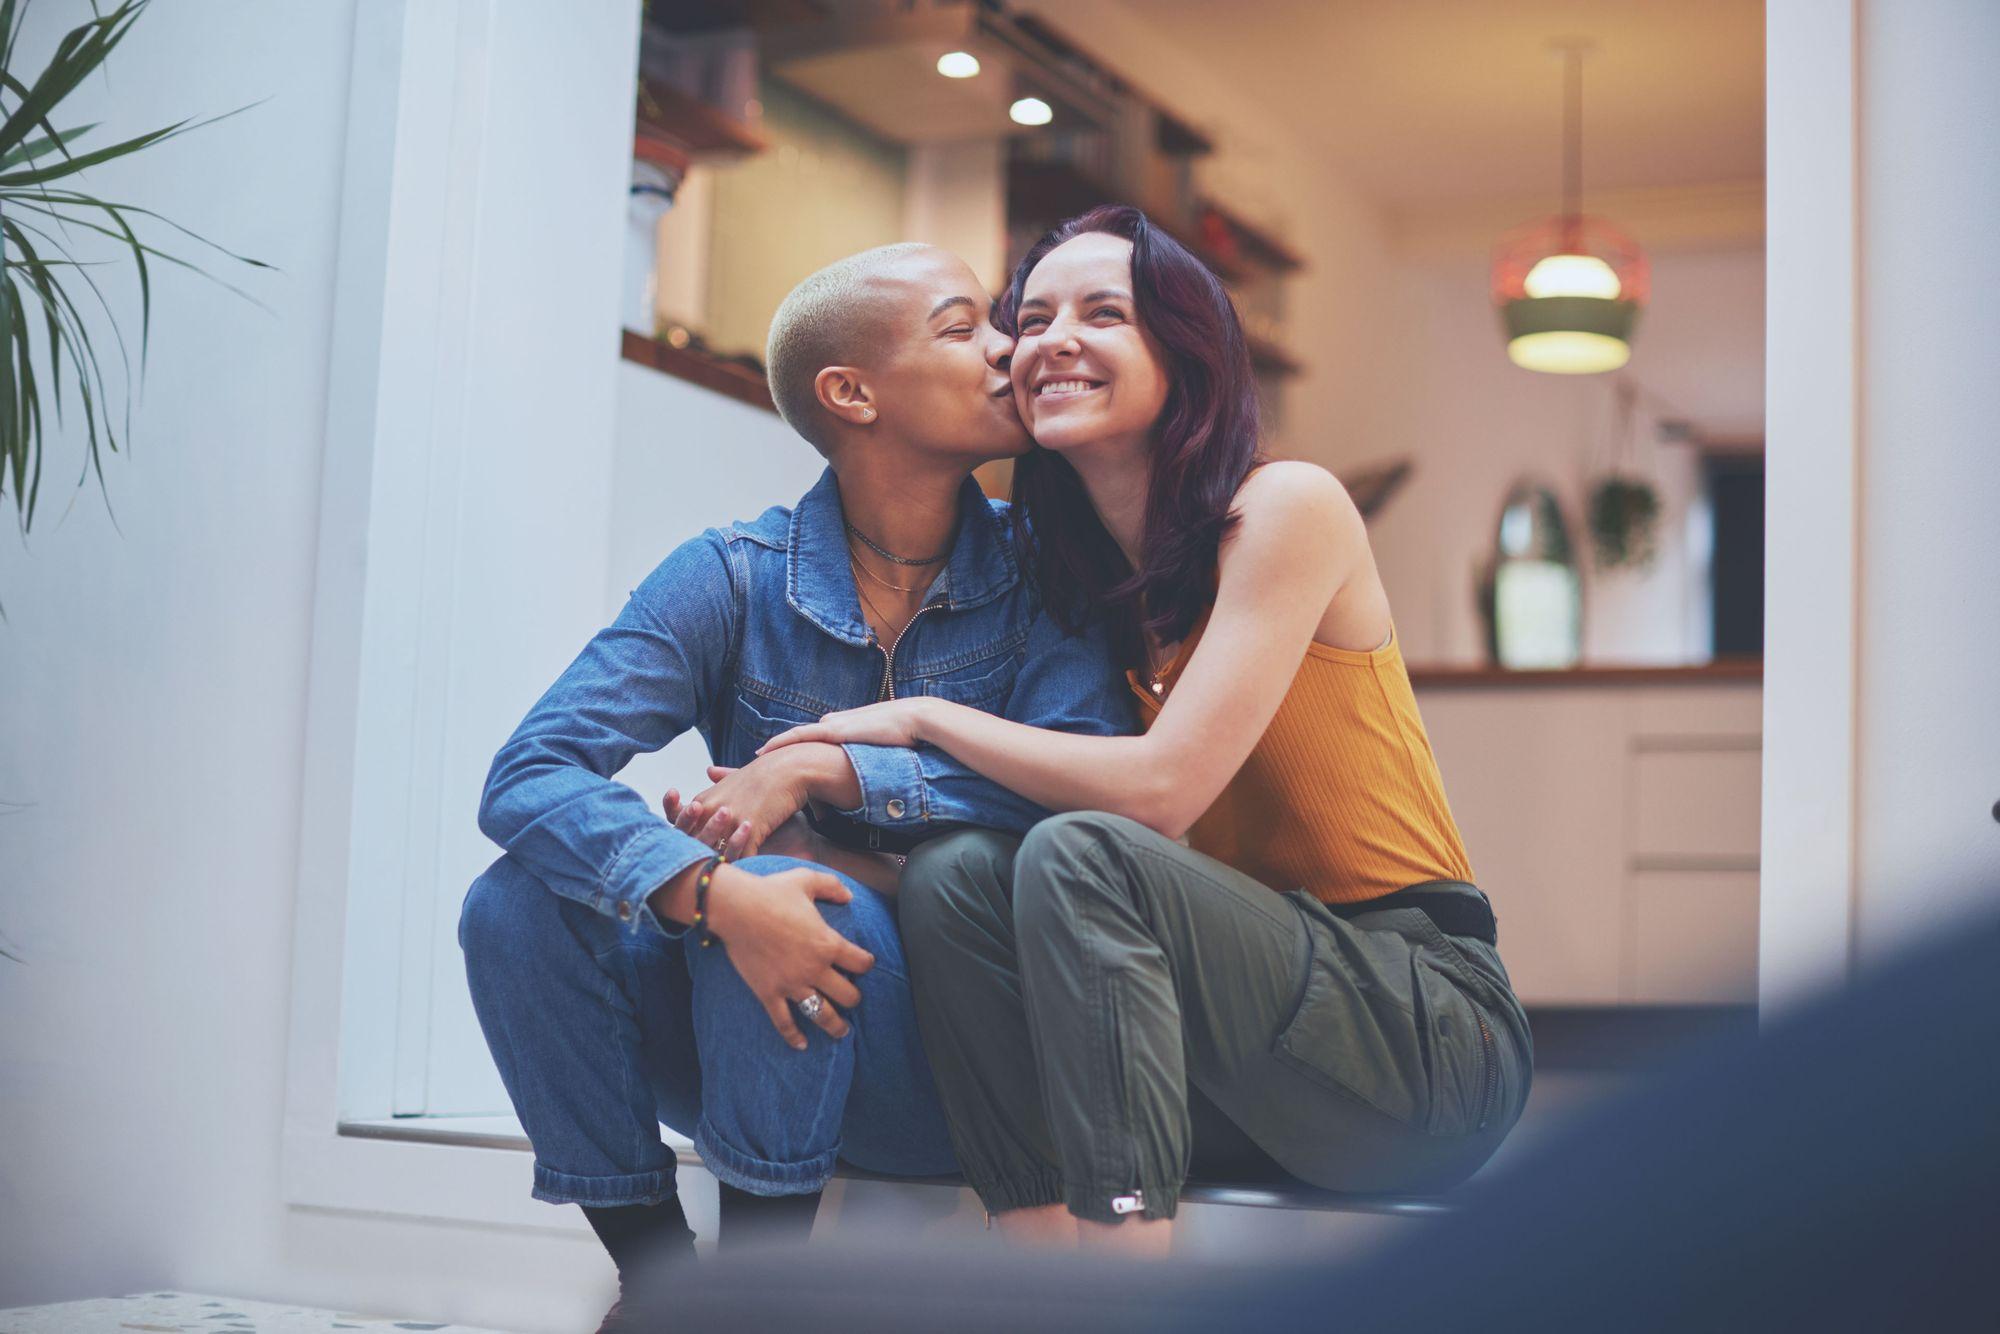 Happy couple kiss on cheek